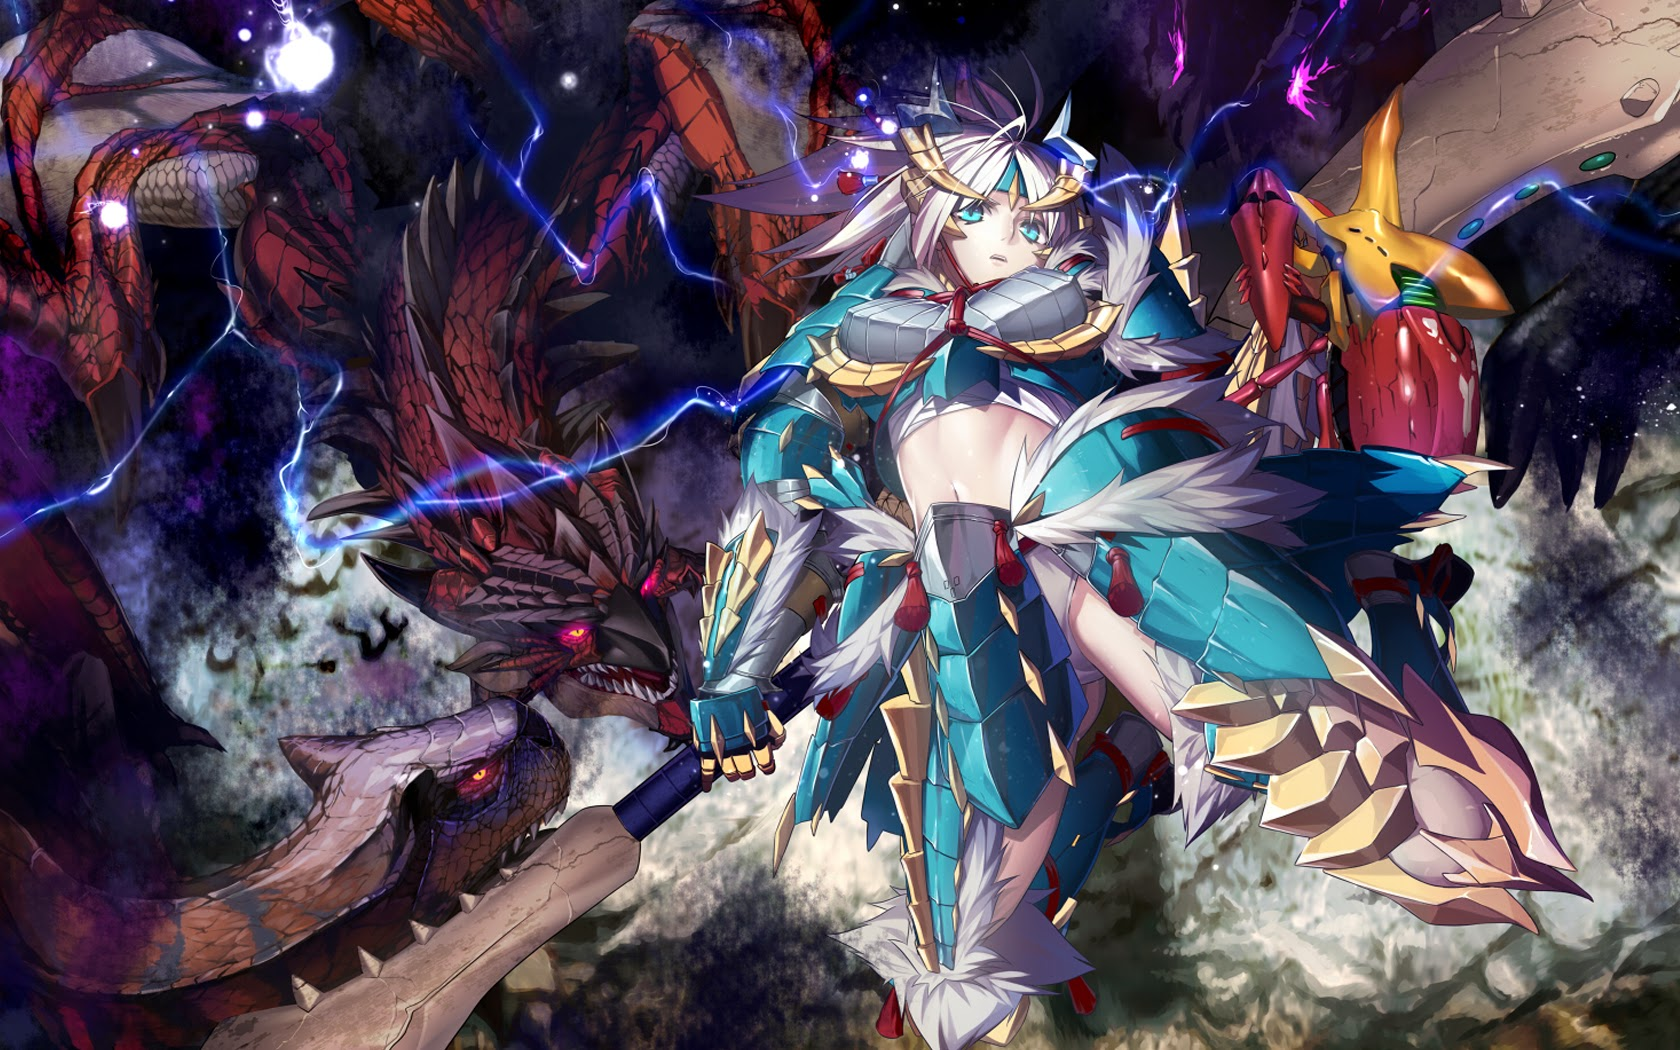 Anime Girl Monster Hunter Dragon Armor Weapon Hd Wallpaper 1680x1050